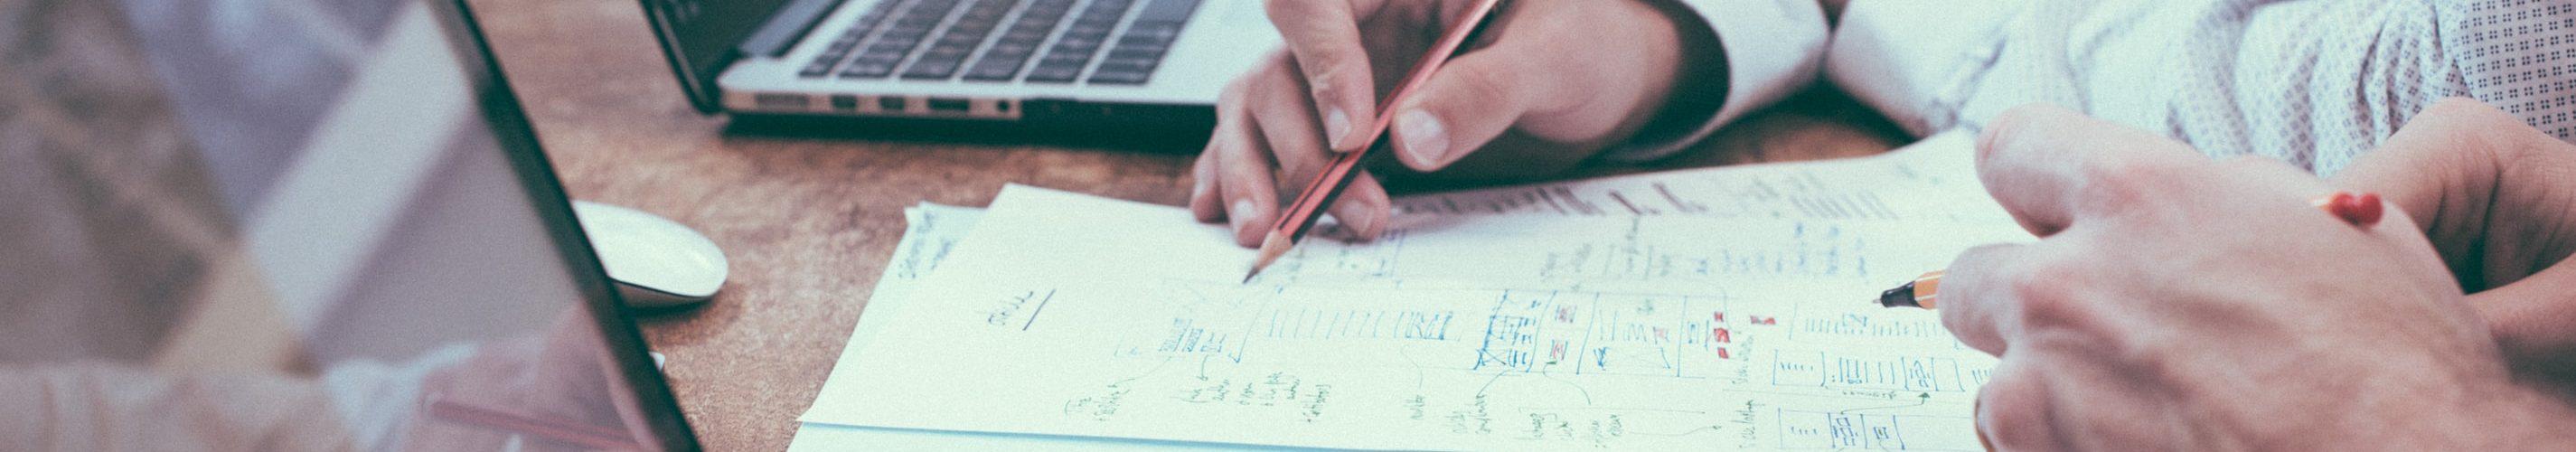 financie-overzicht